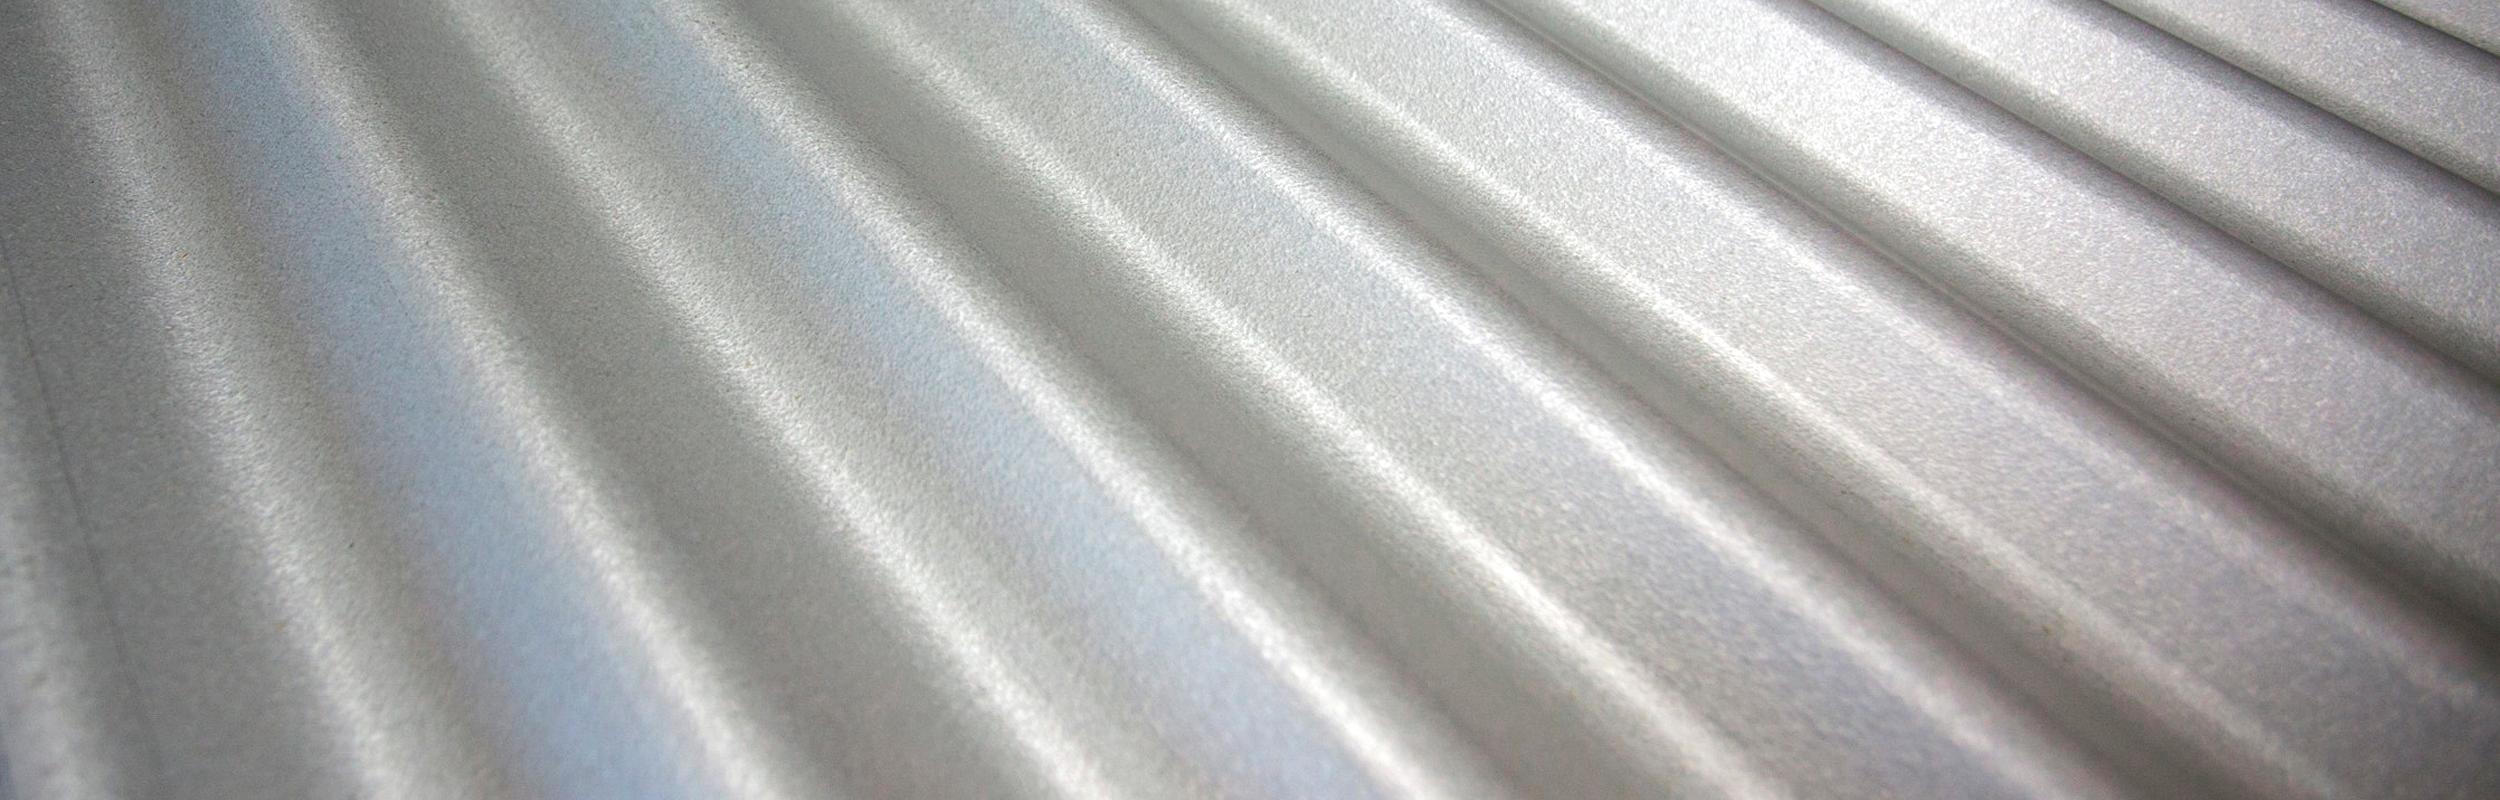 Zinc Roofing Materials Freeman Group Roofing New Zealand